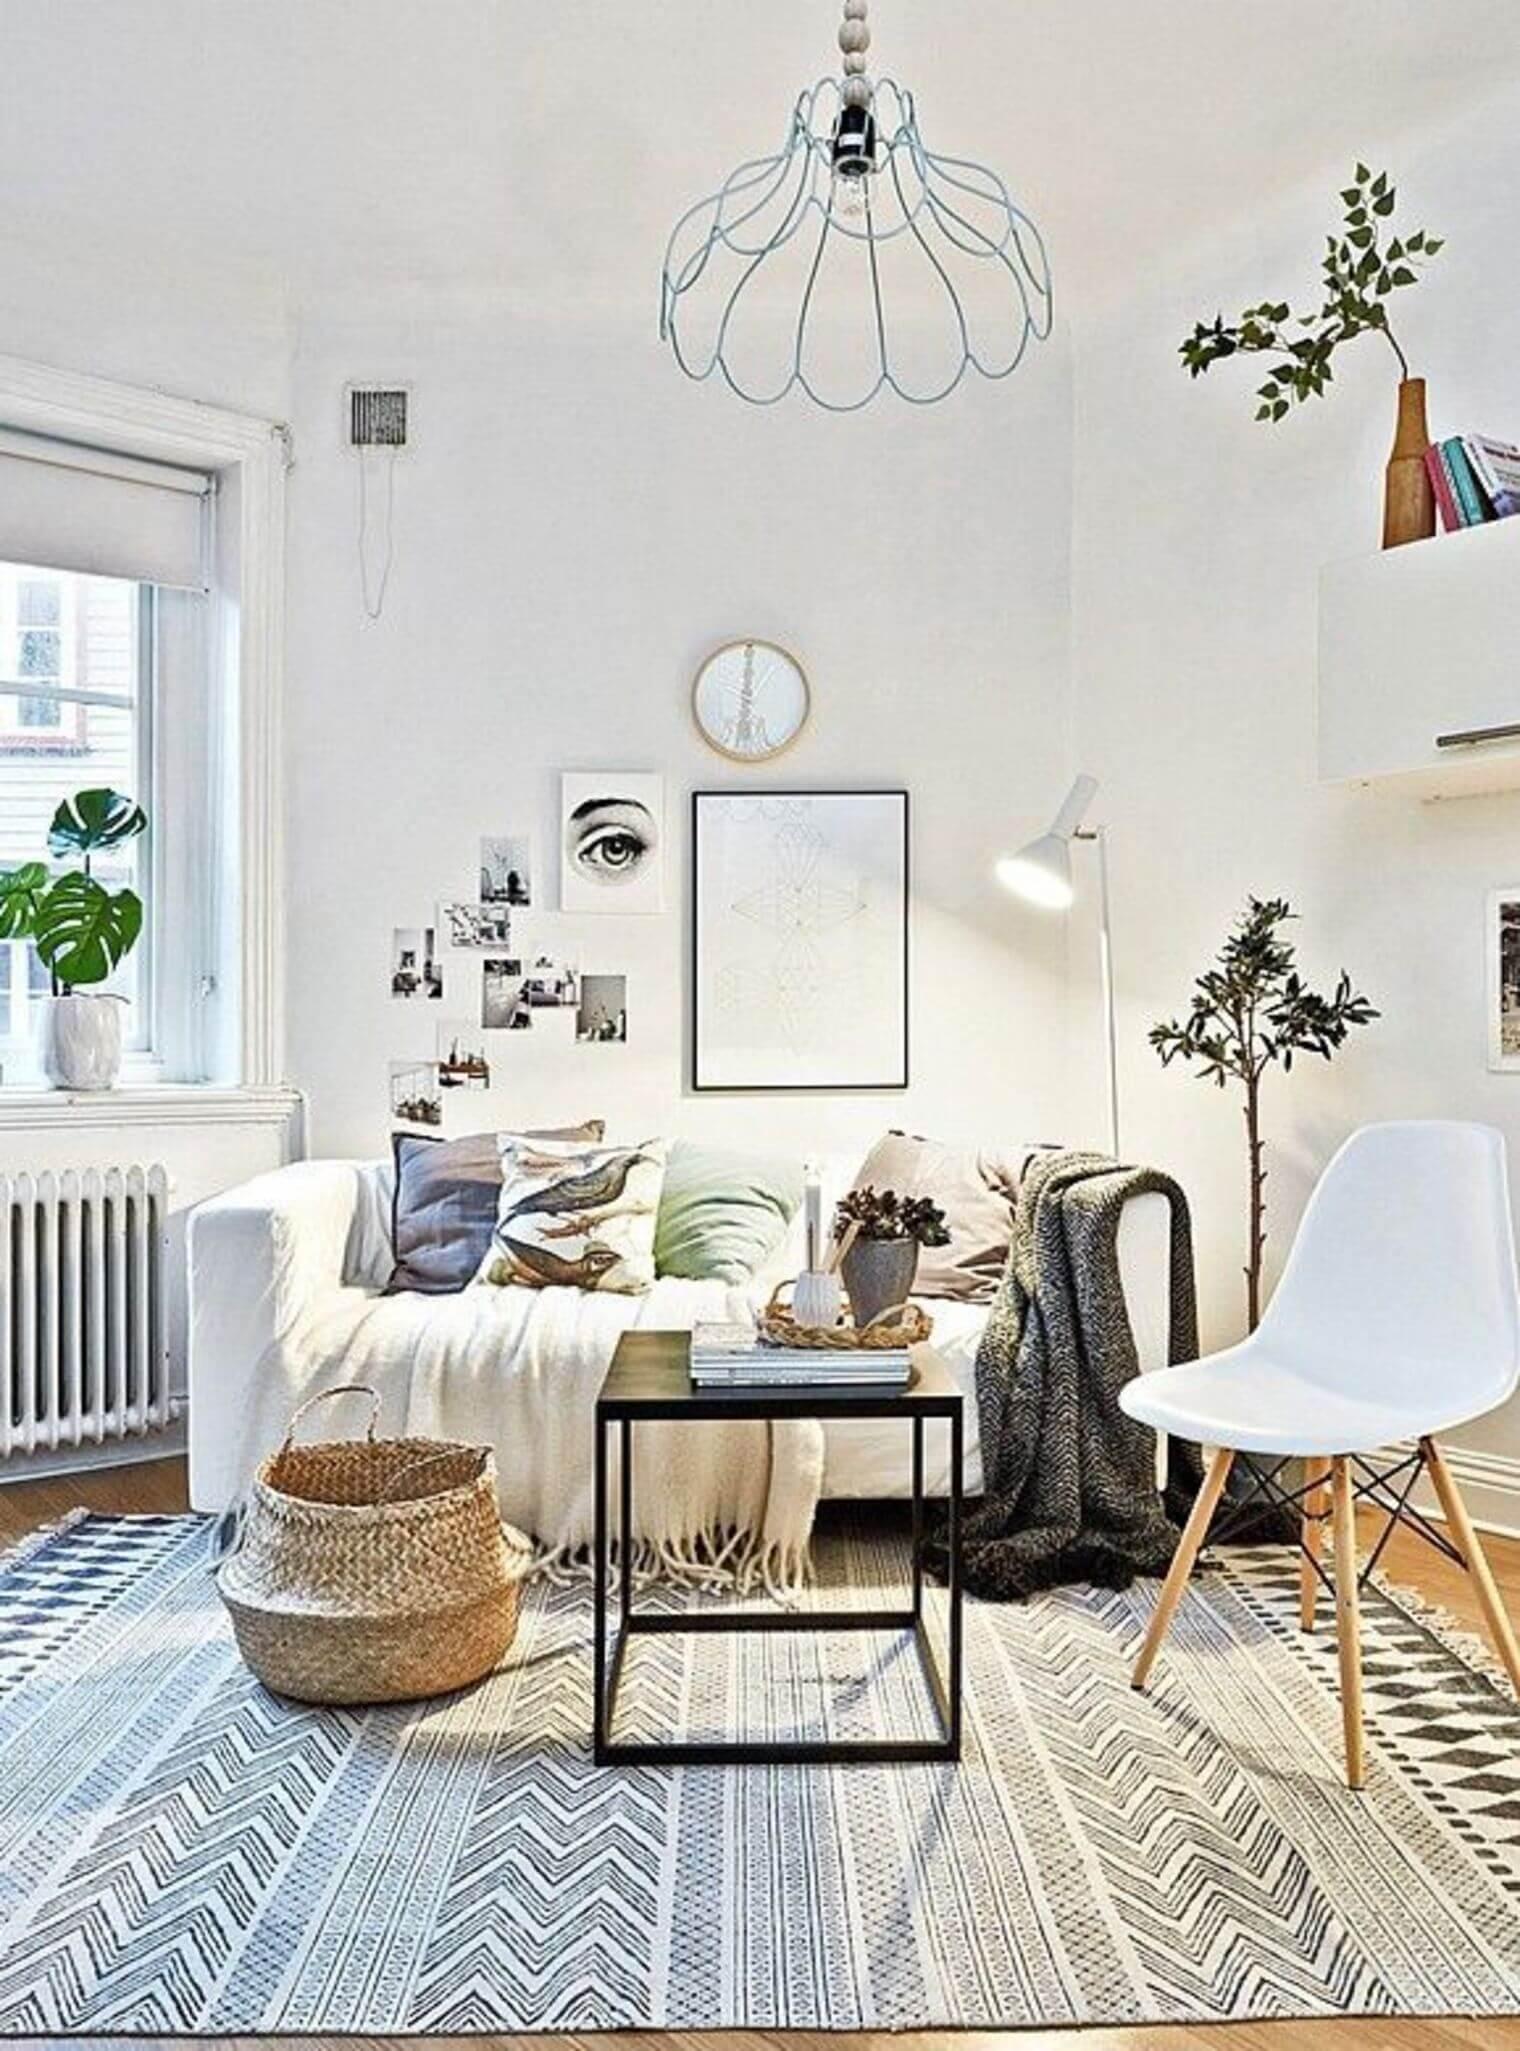 d coration scandinave page 3 de 65 frenchy fancy. Black Bedroom Furniture Sets. Home Design Ideas